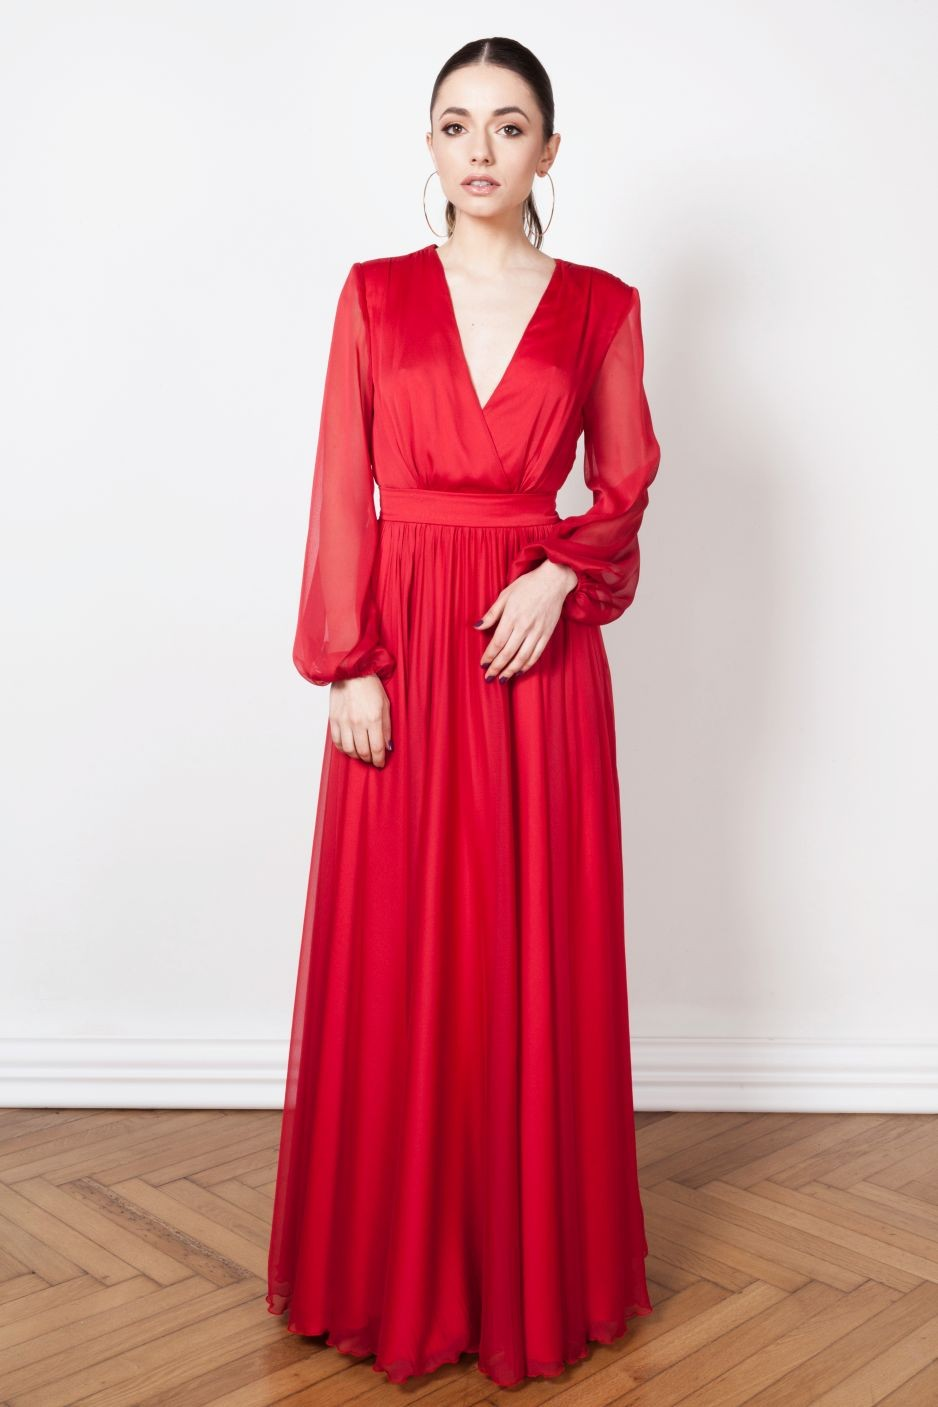 12-rochie-maxi-rosie-cloche-20-de-idei-de-rochii-pentru-craciun-fabulous-muses